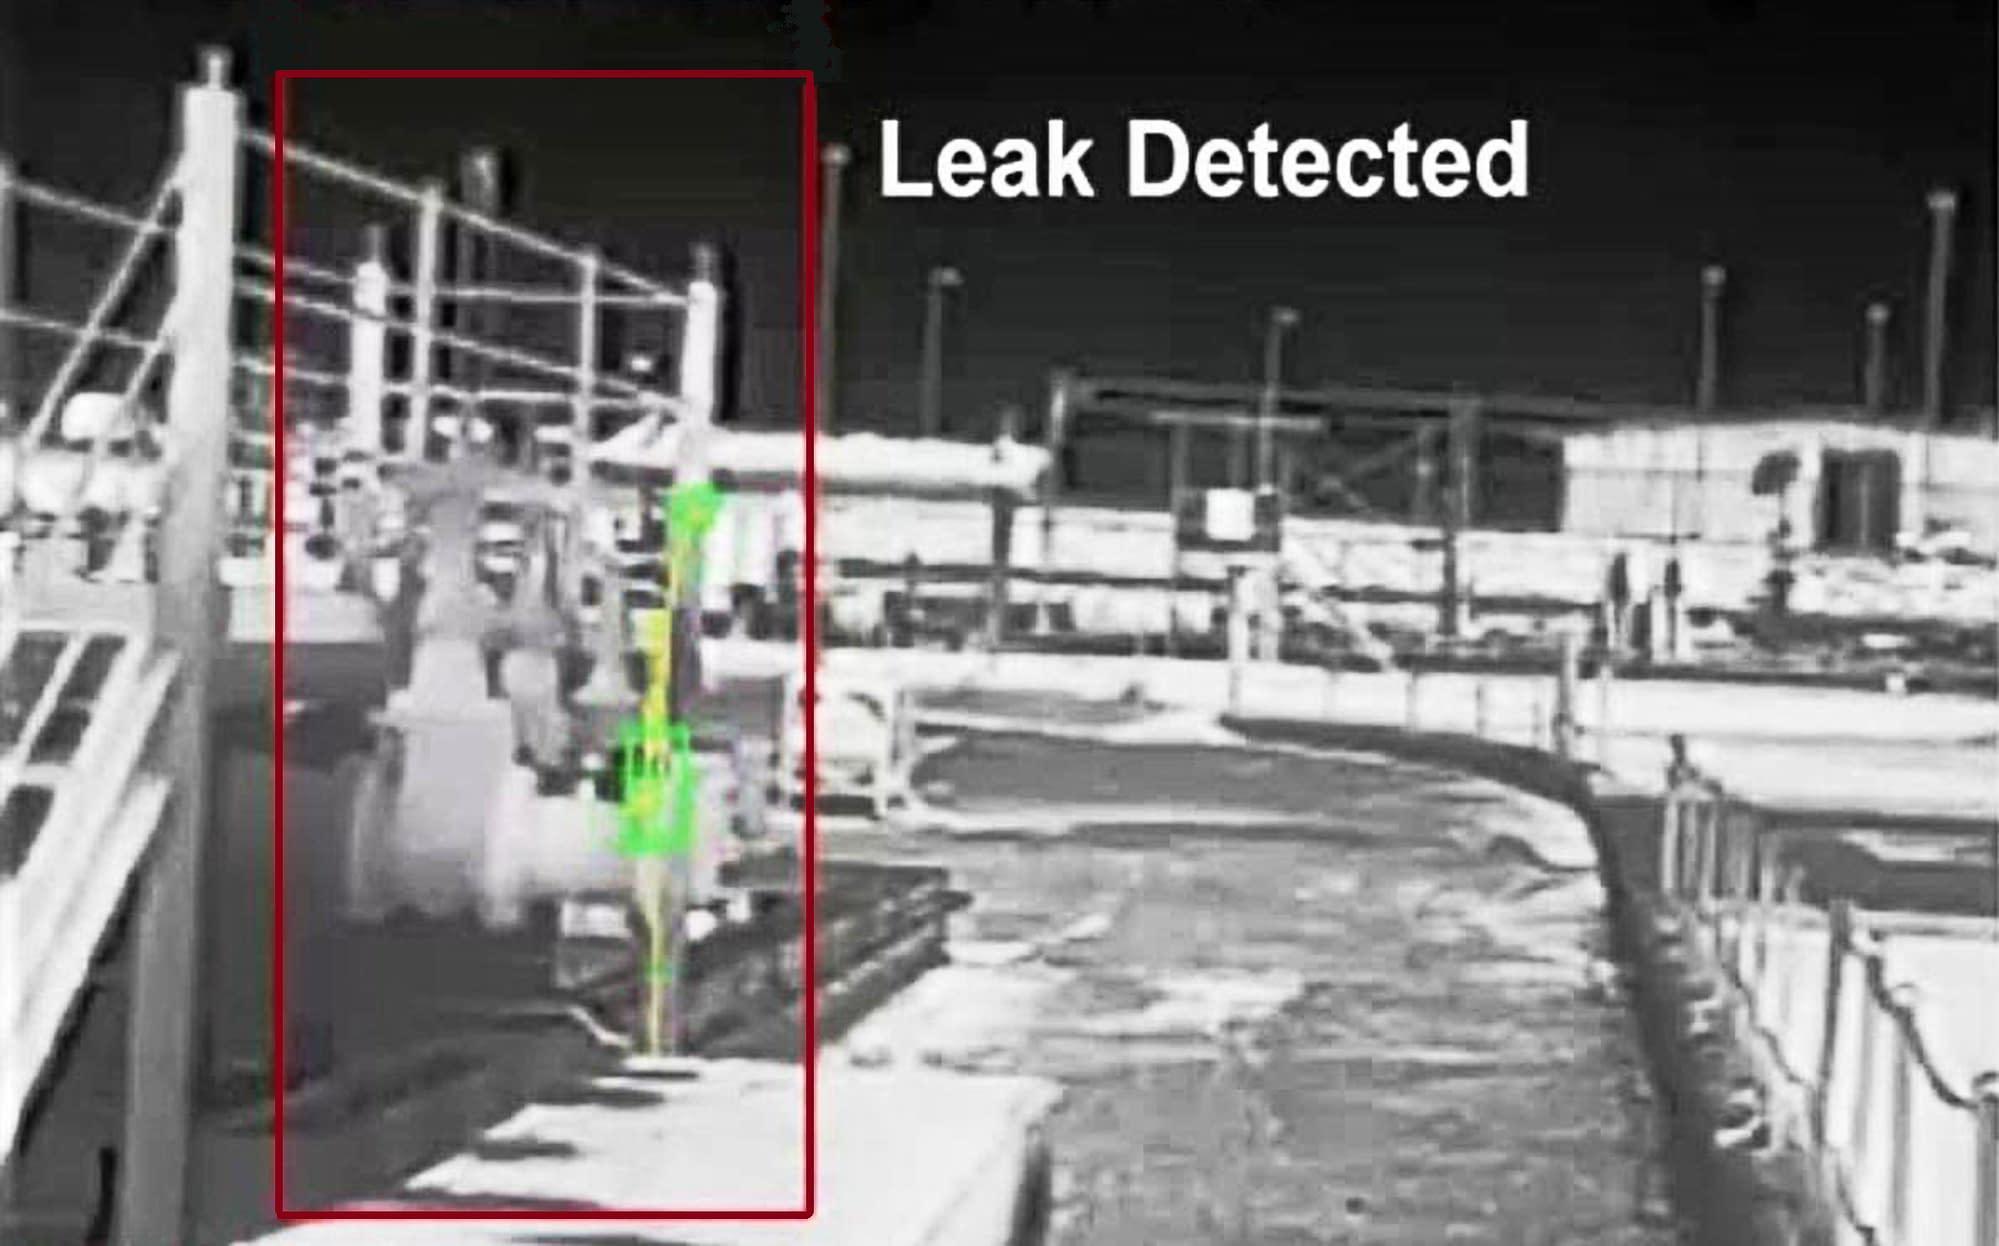 Liquid pipeline leak detection using video analytics technology